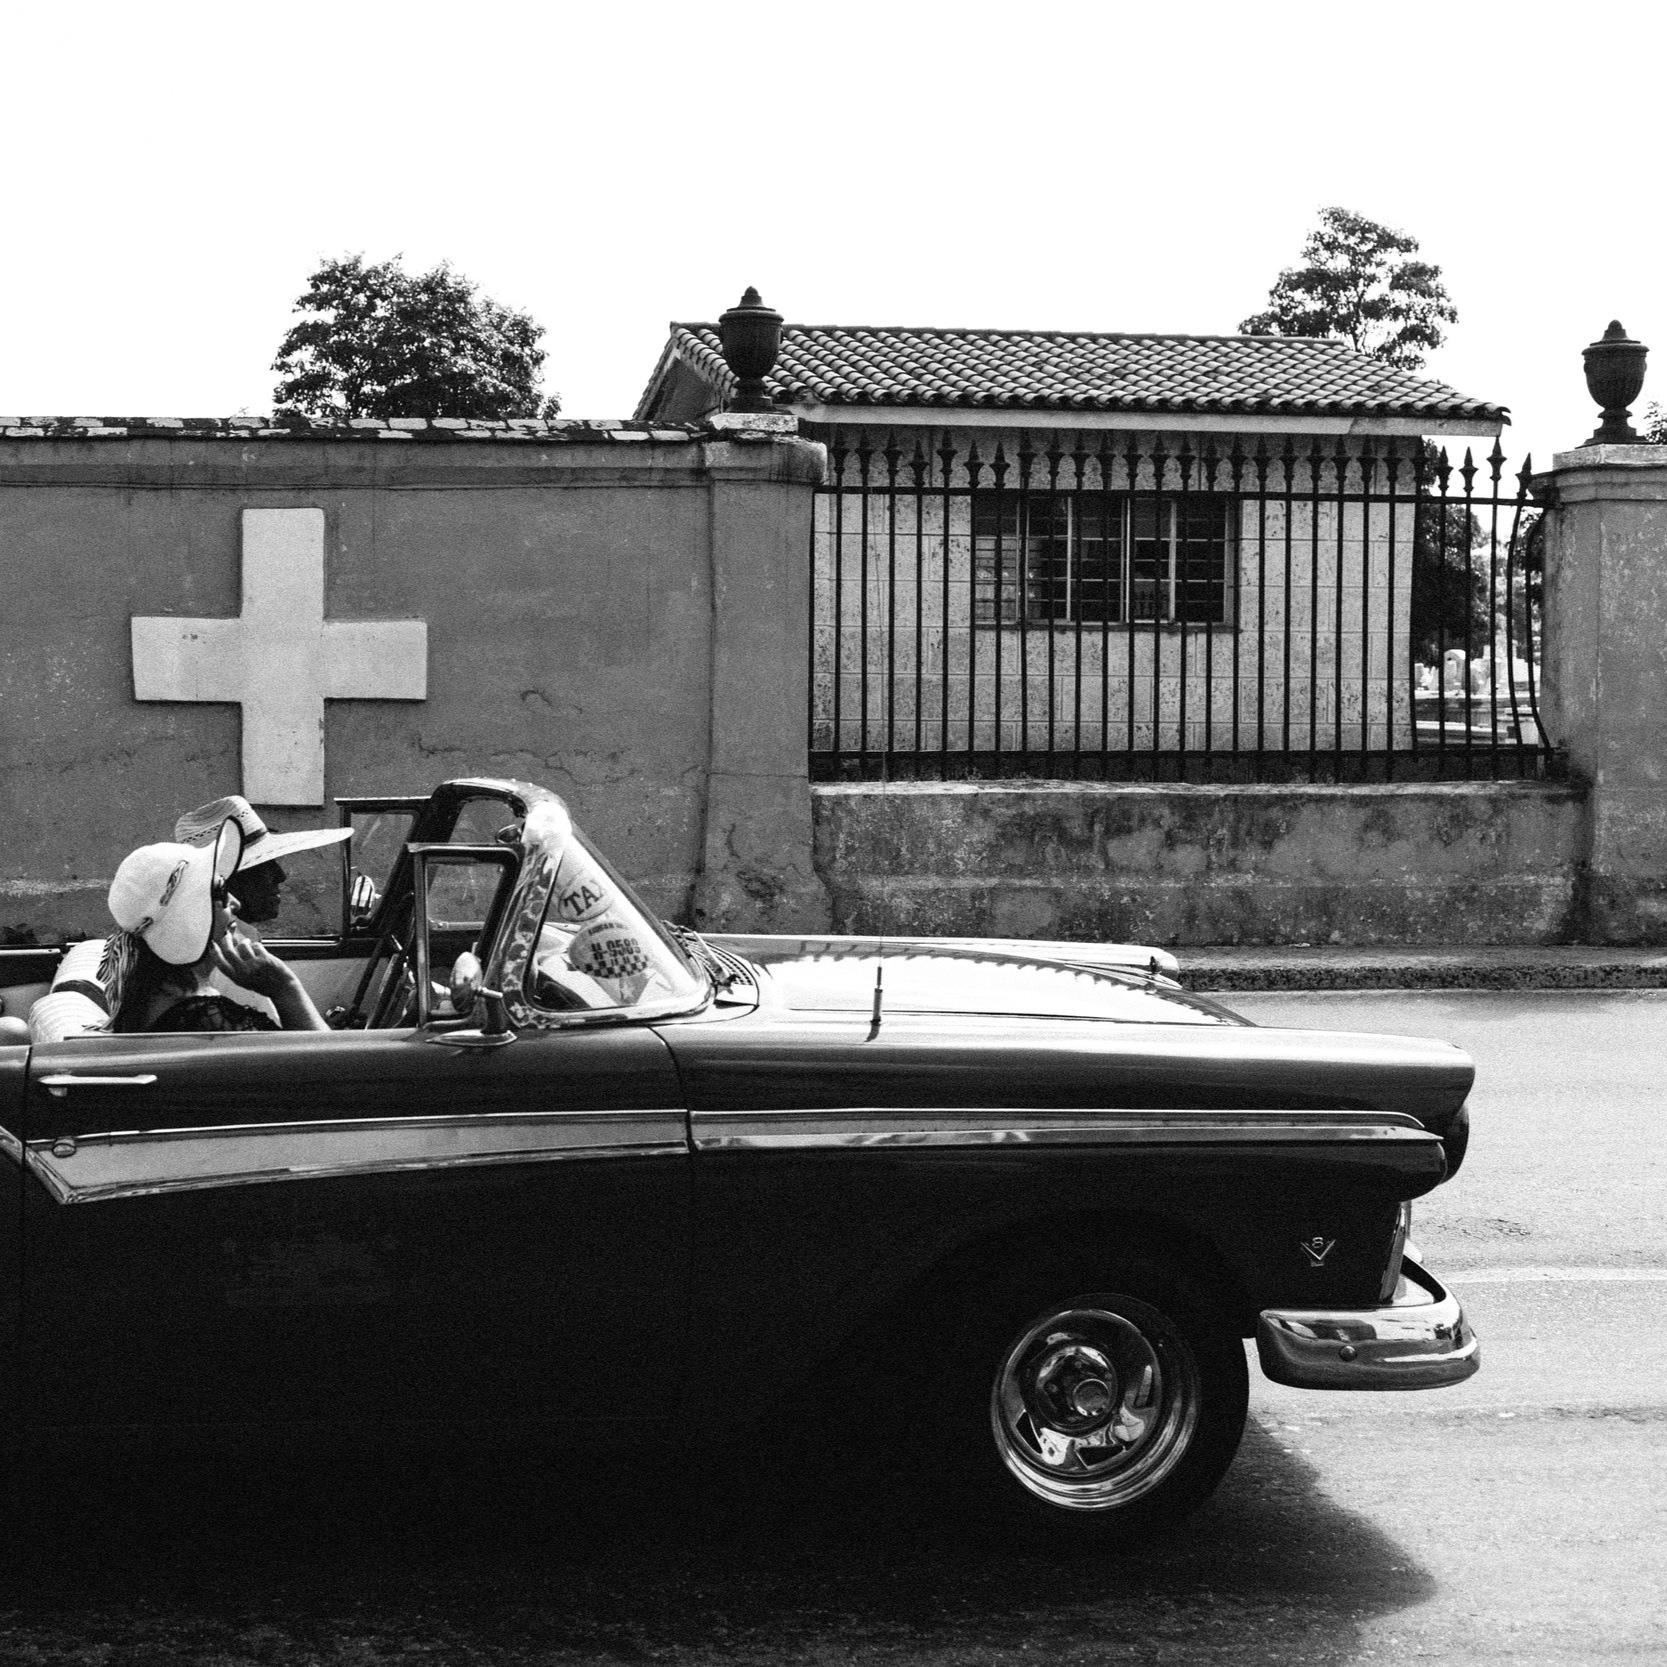 CMR-OO-Cuba-Feb2019-0877.jpg